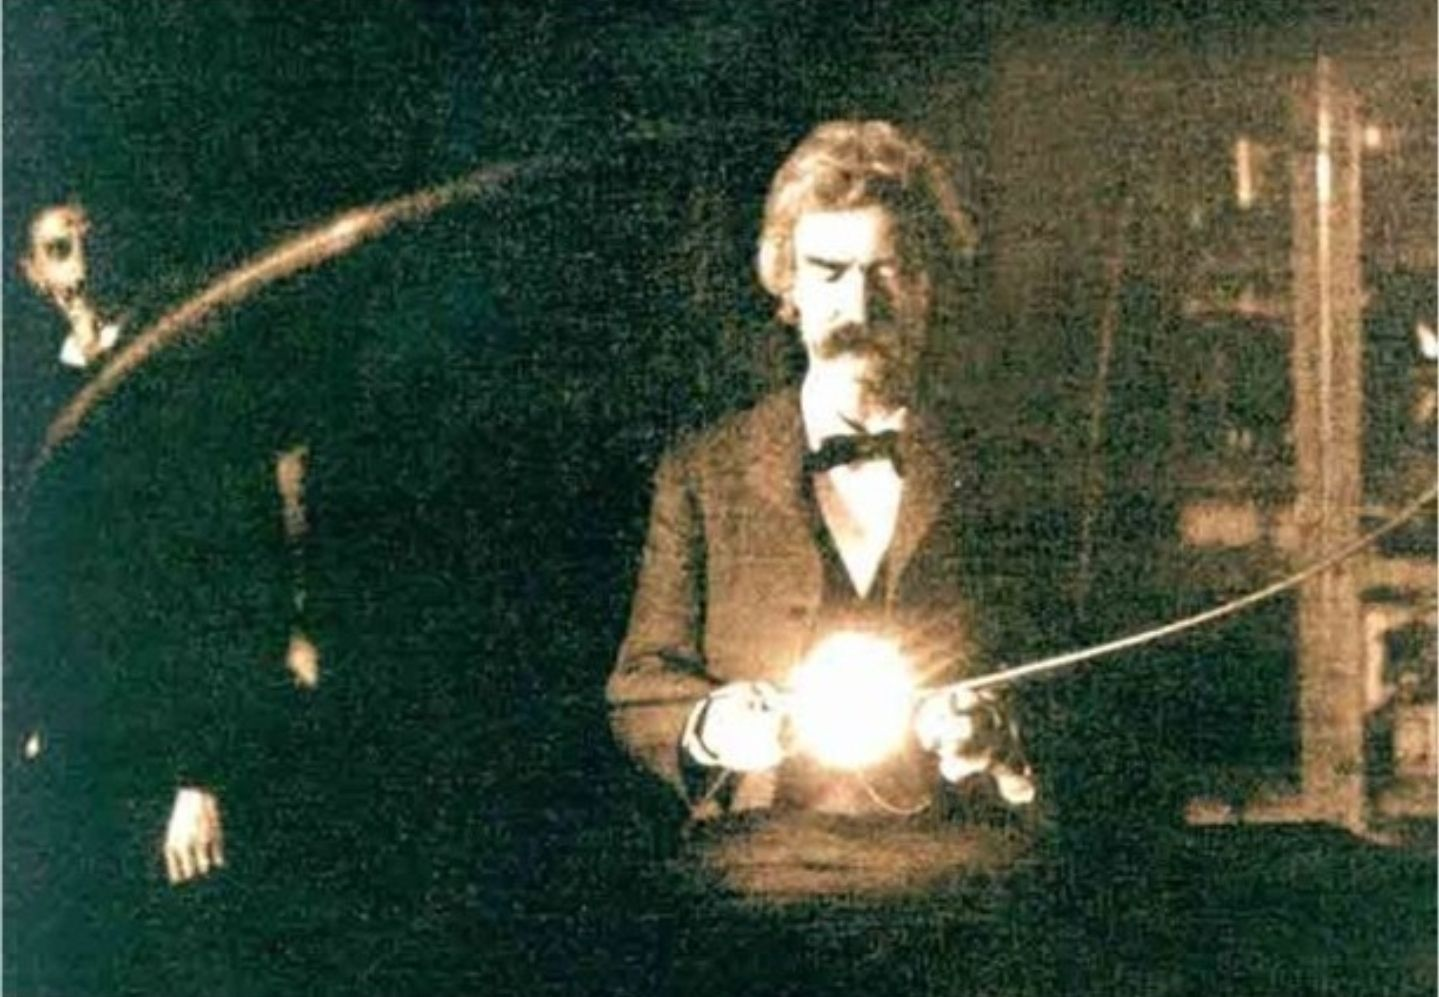 Mark Twain hanging out with Nikola Tesla.  Real magic power. https://t.co/yIbEcYhwnD